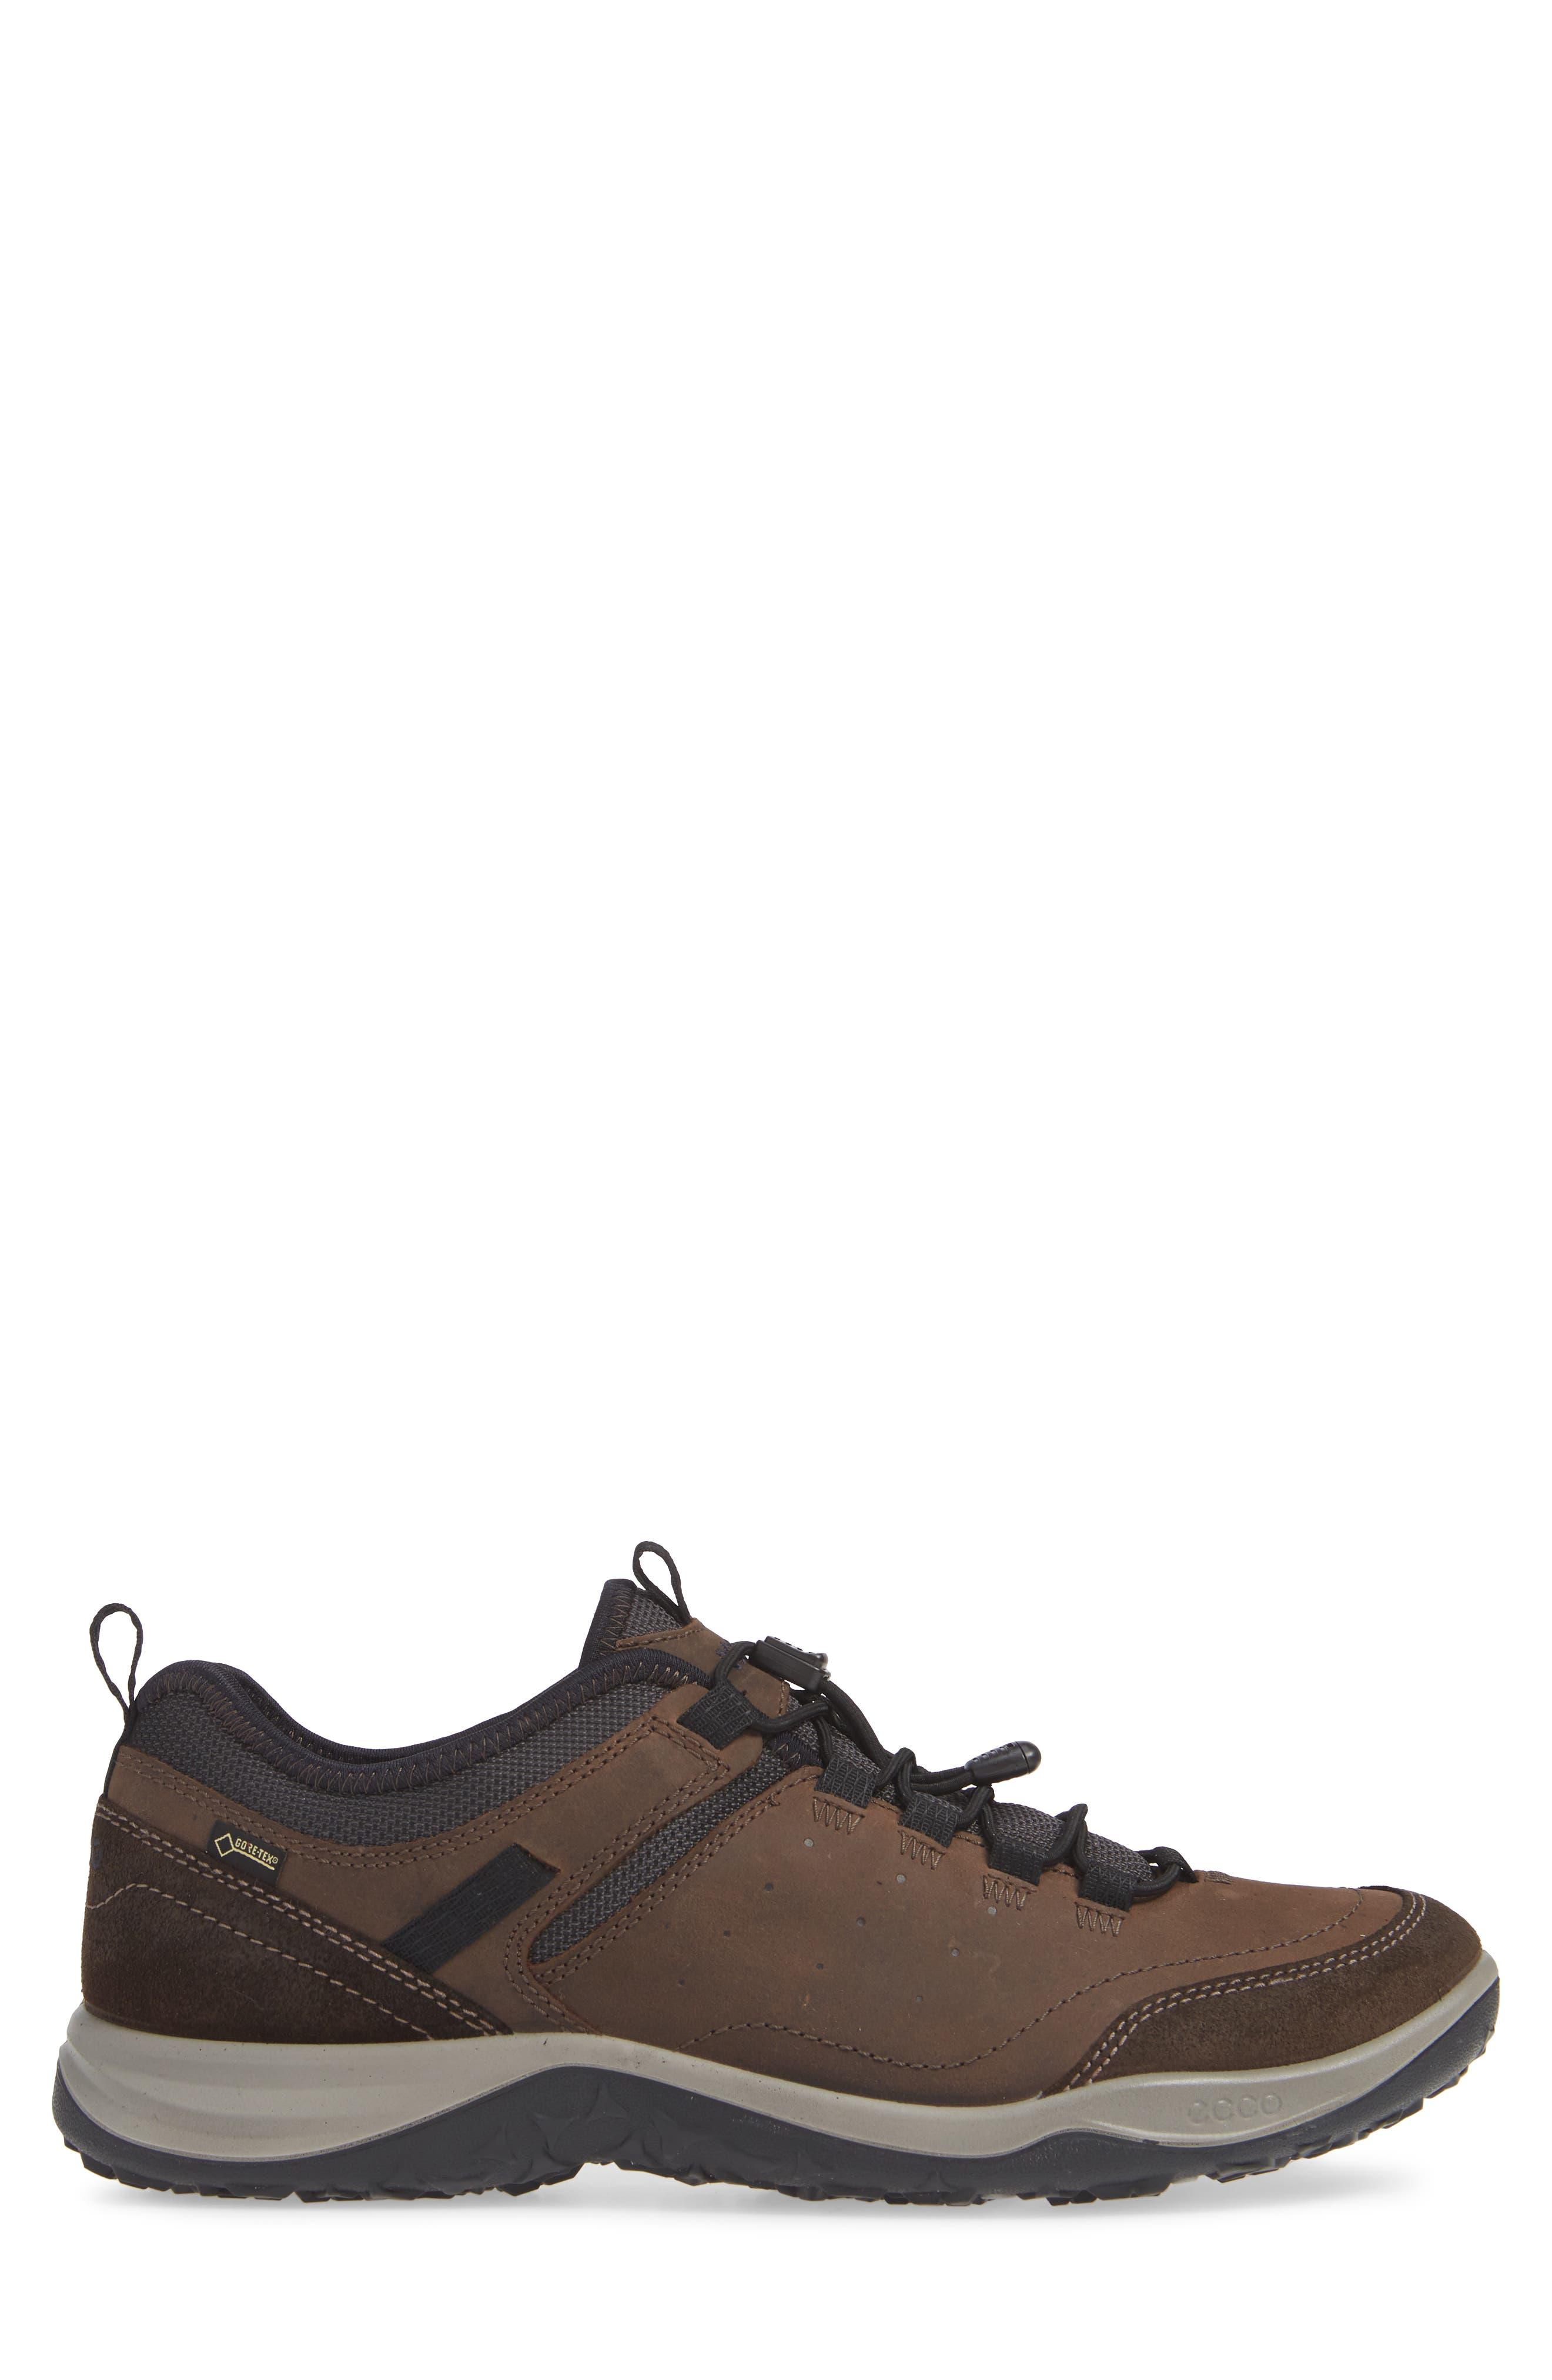 'Espinho GTX' Sneaker,                             Alternate thumbnail 3, color,                             ESPRESSO NUBUCK